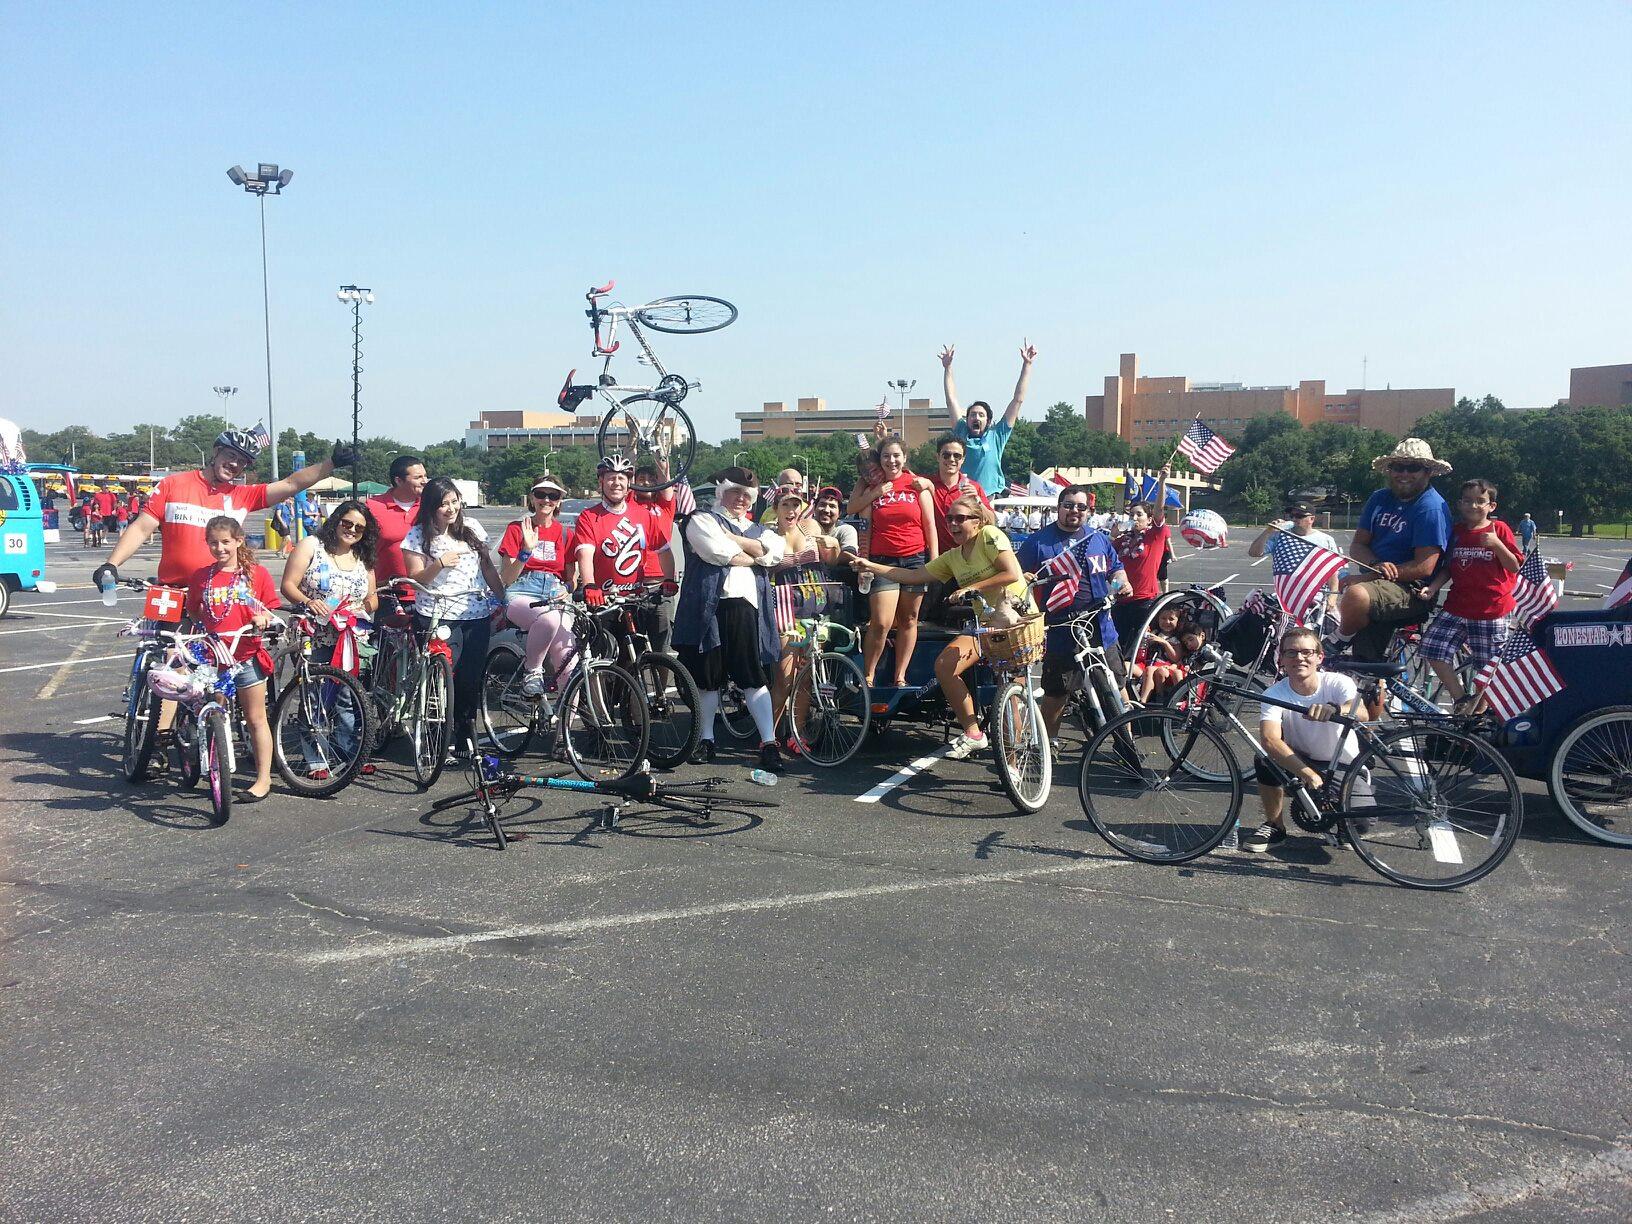 Bikes Inc Arlington Tx Here s the group again